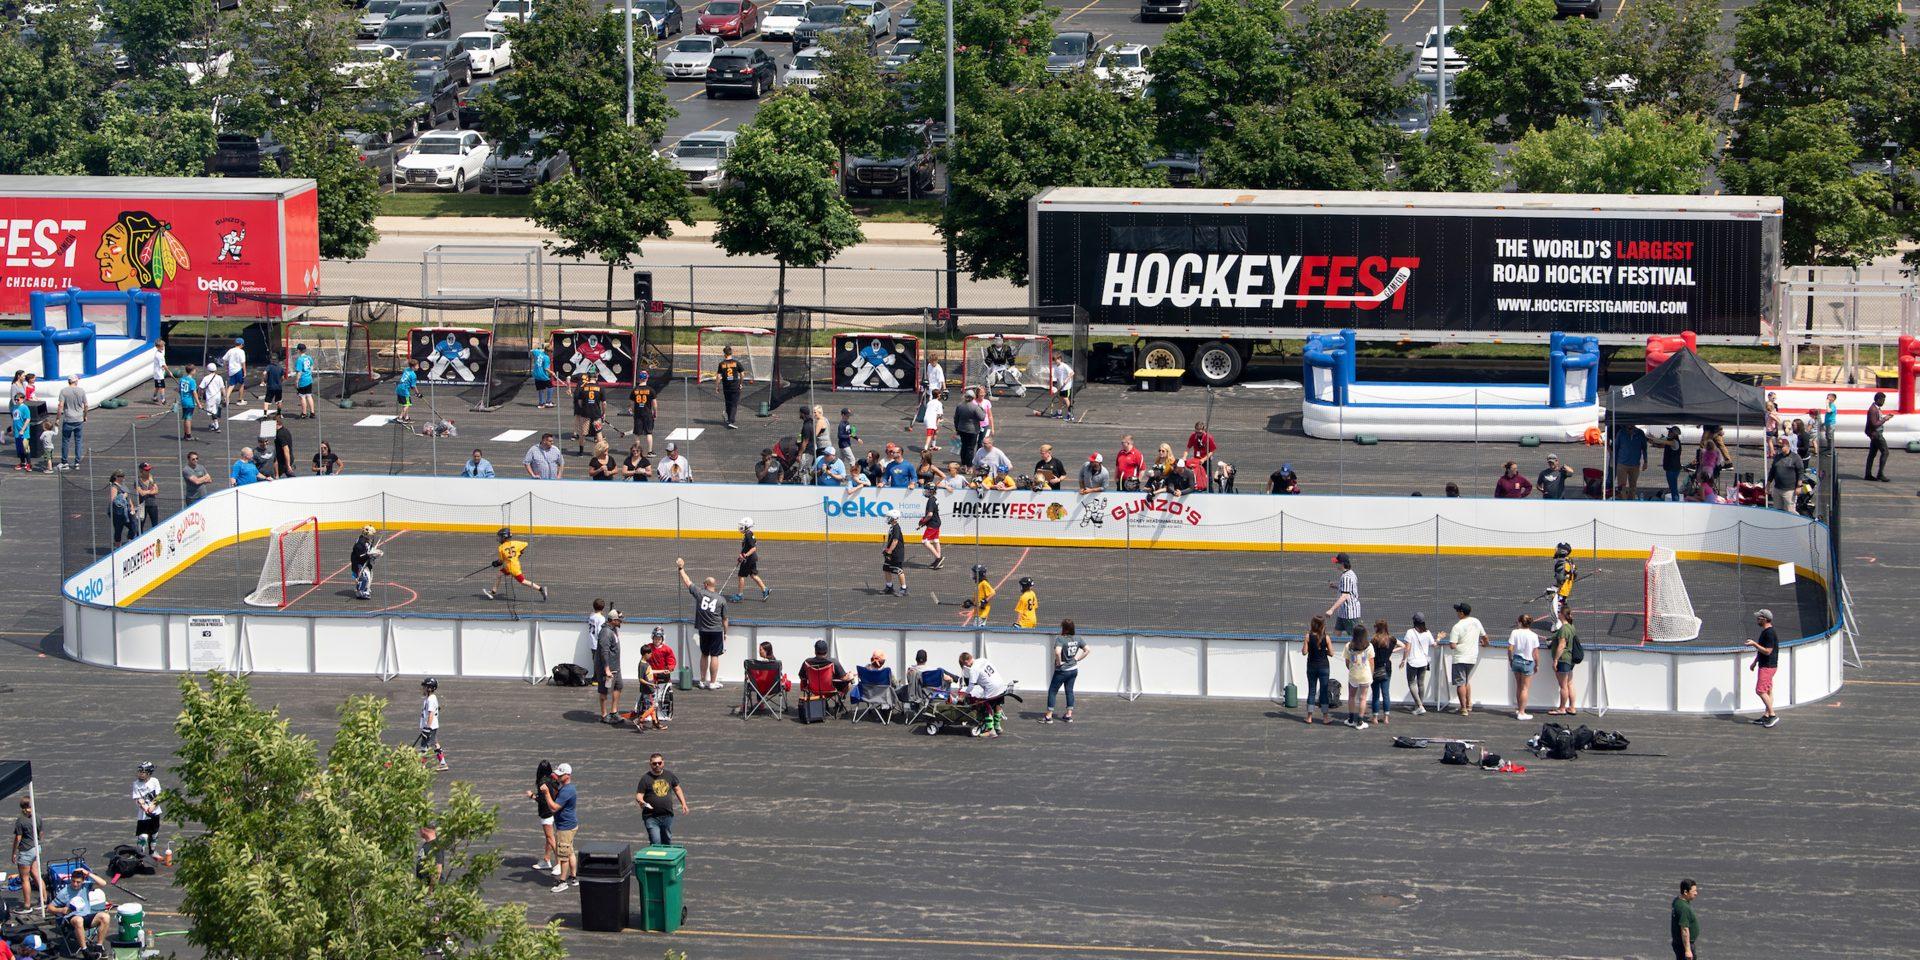 HockeyFest Drops Puck on Comeback